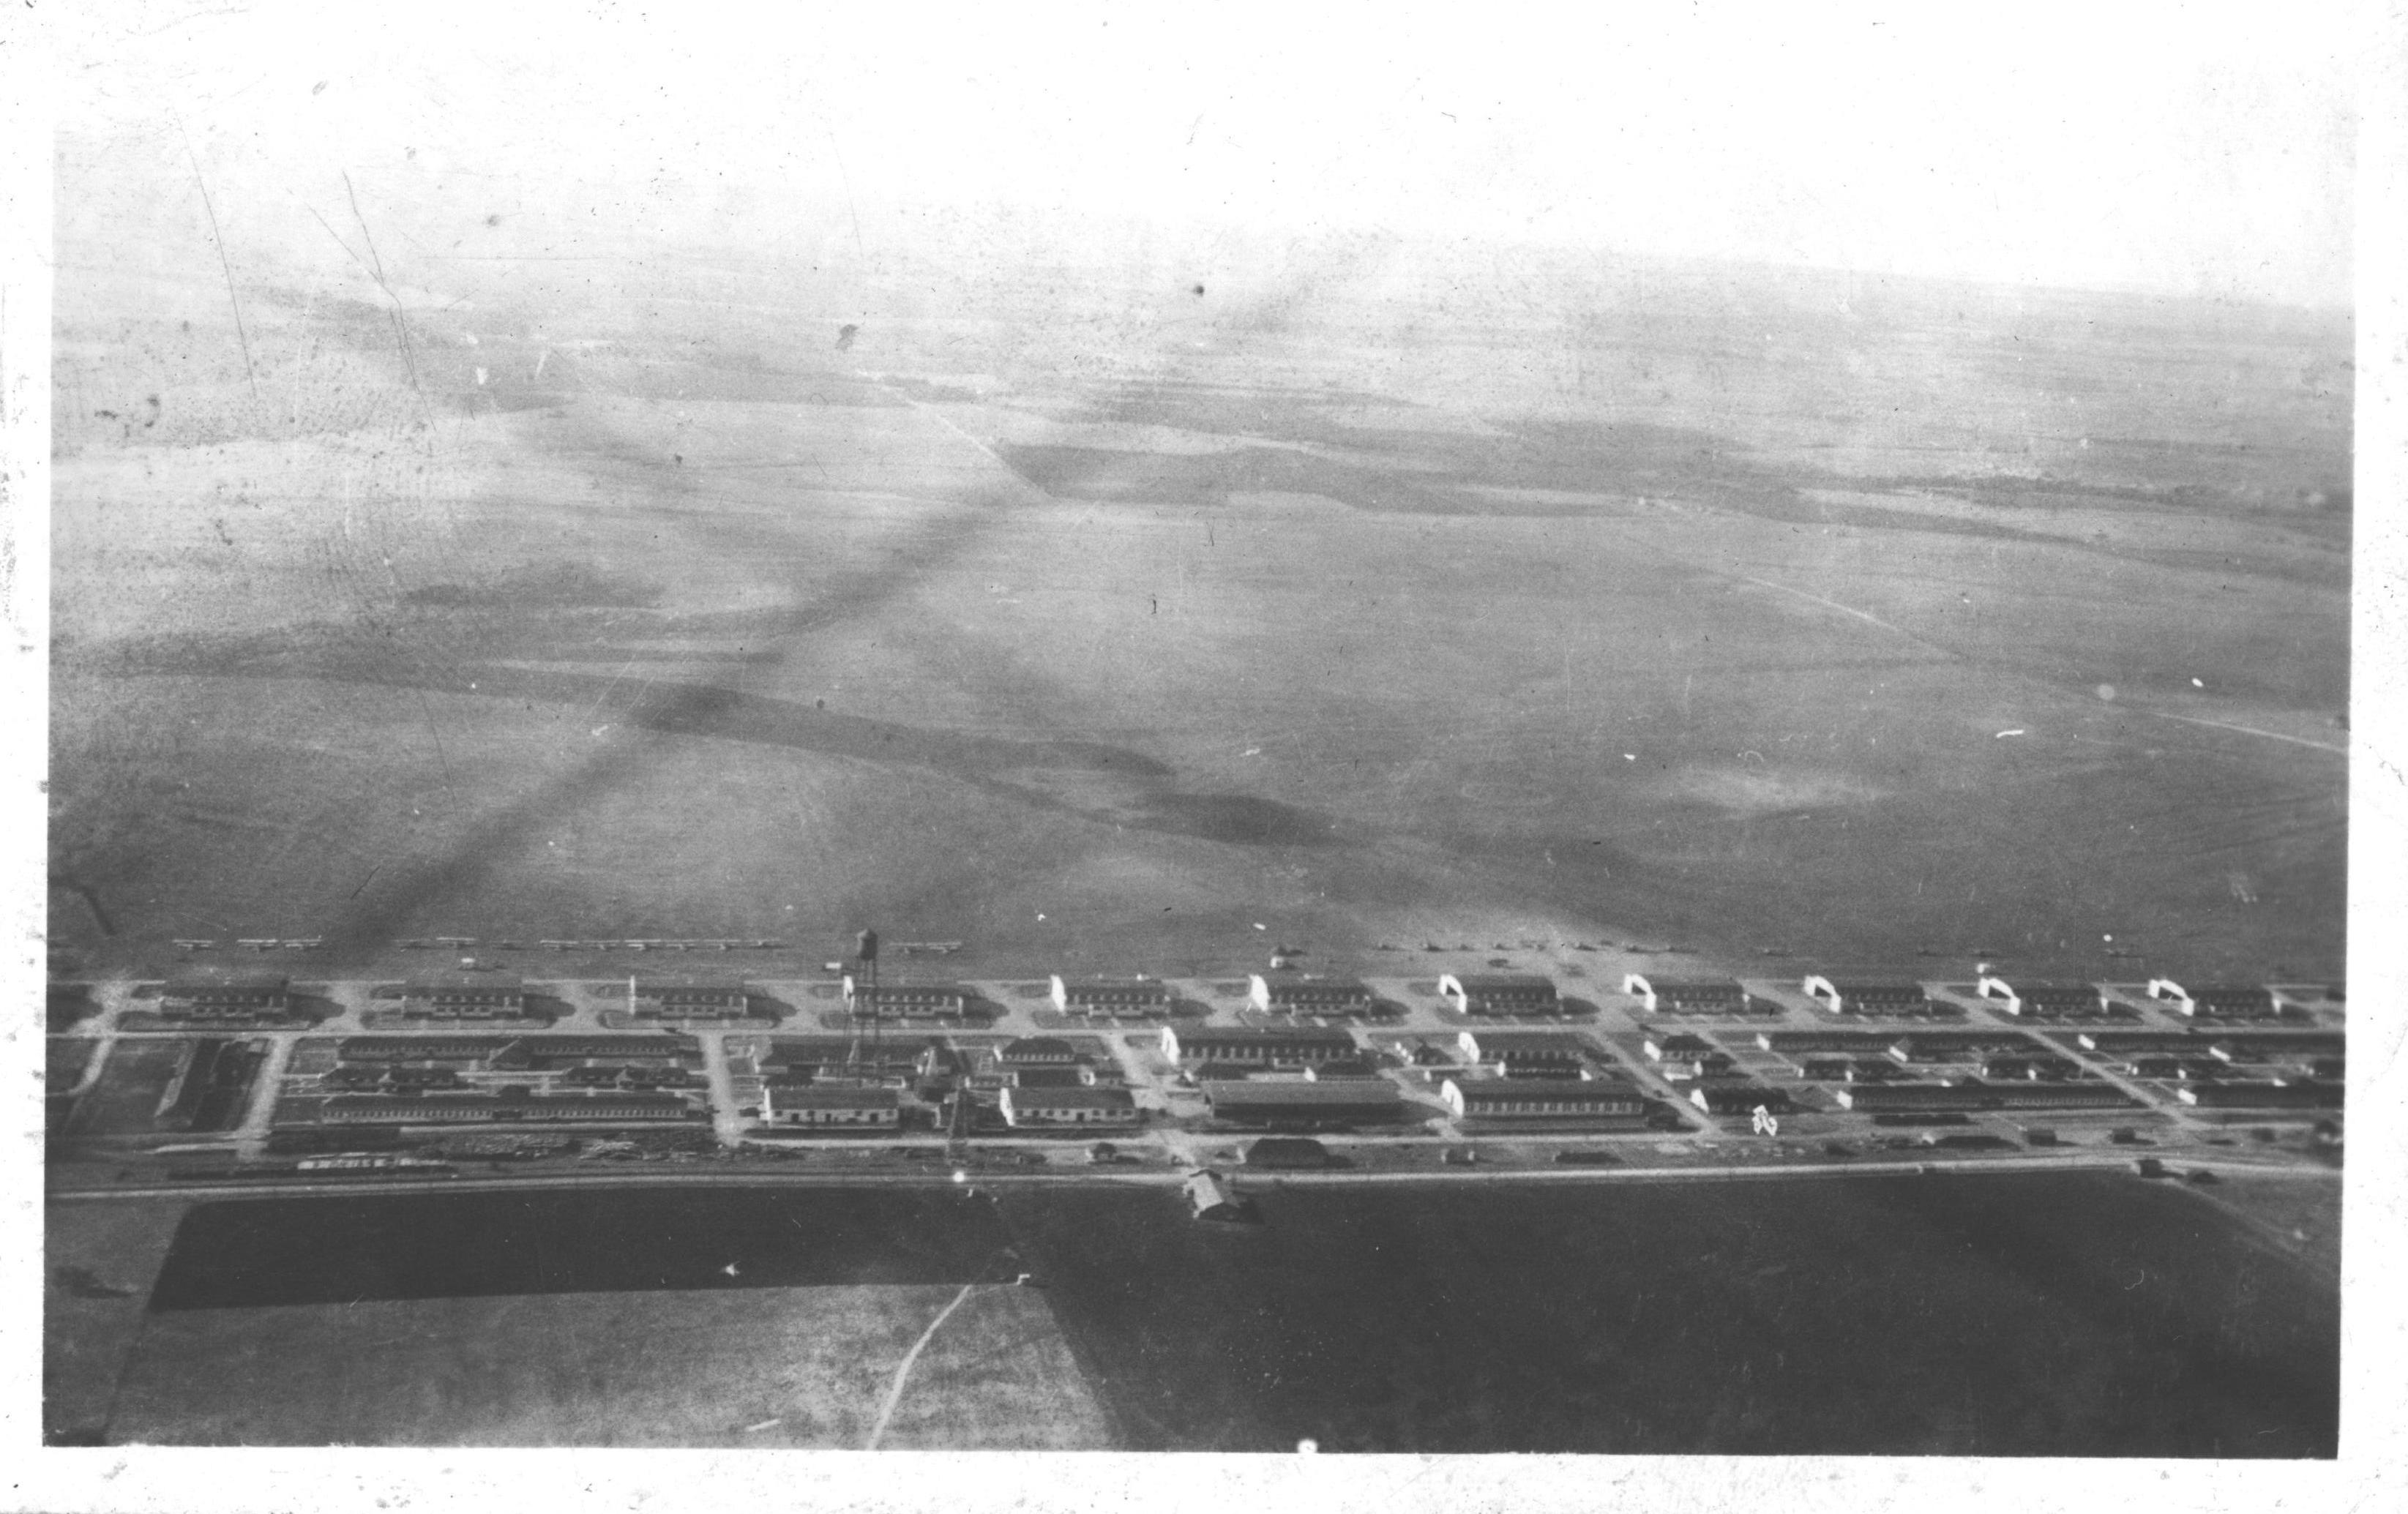 Barron Field, Fort Worth 1917